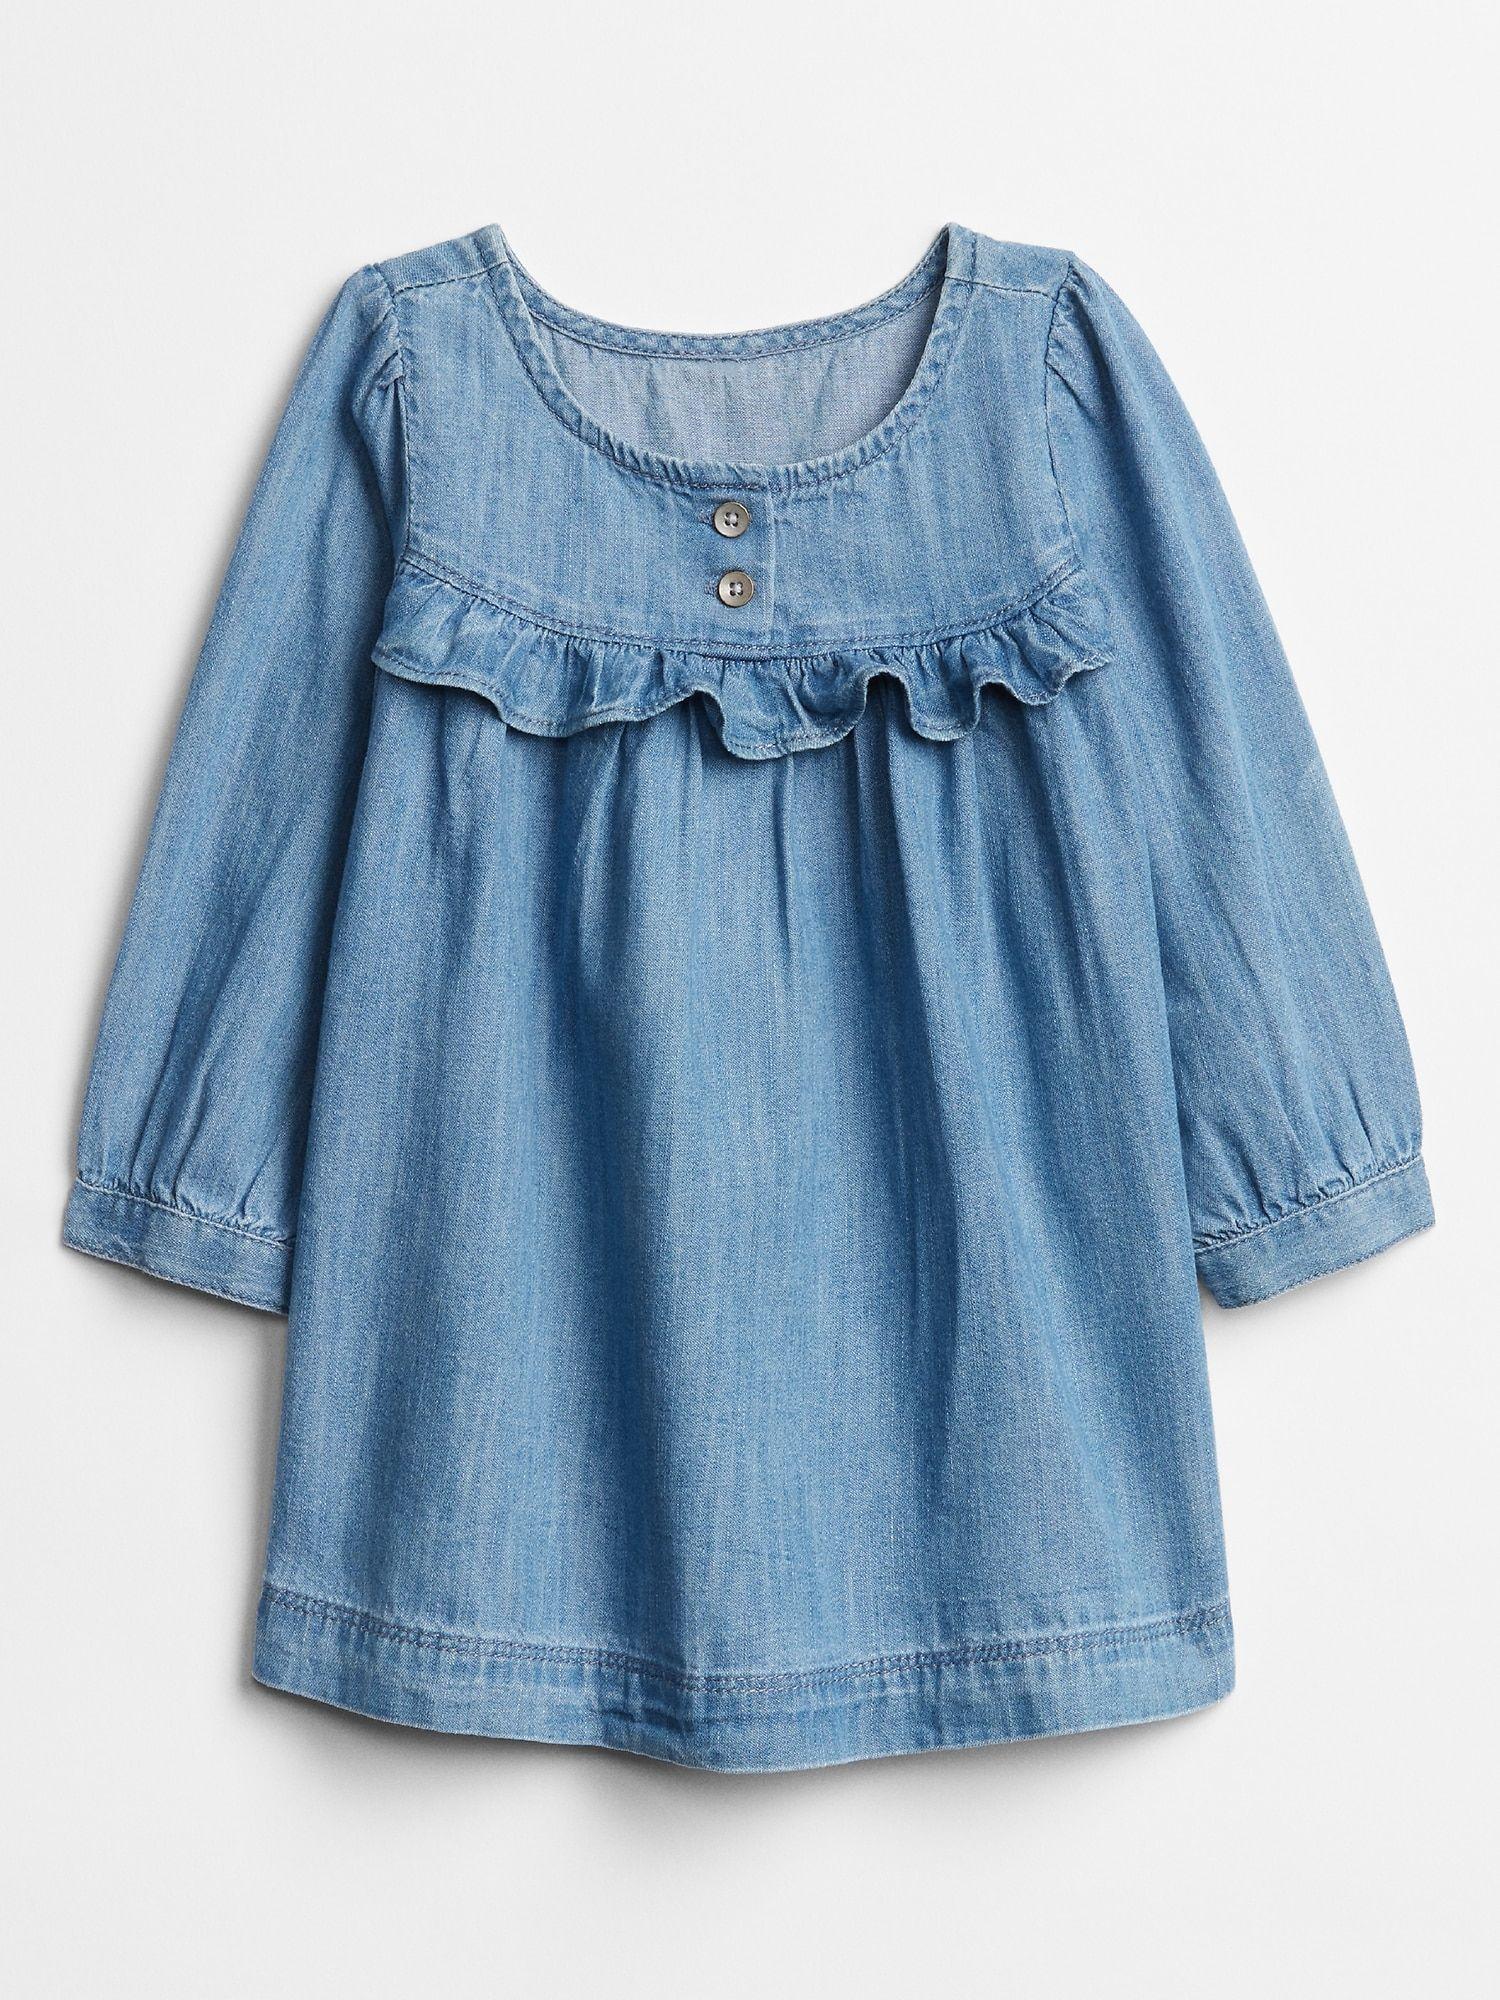 Baby Ruffle Denim Dress Gap Factory Denim Ruffle Dress Girl Outfits Clothes [ 2000 x 1500 Pixel ]